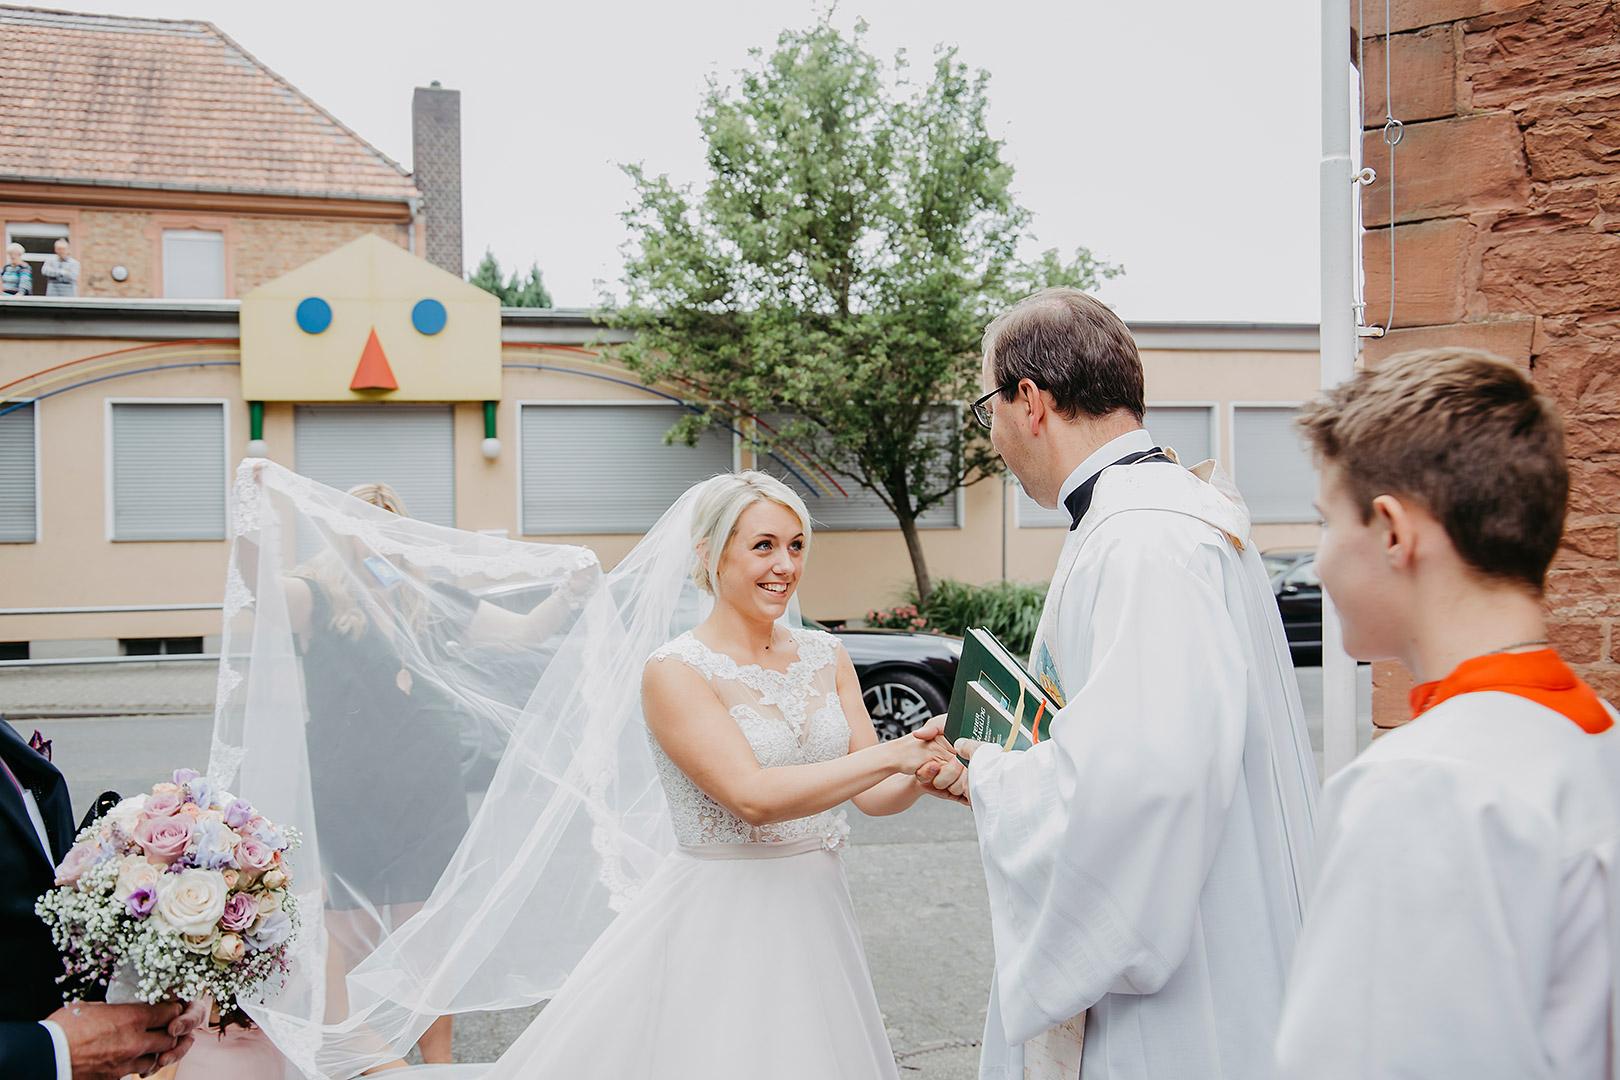 portrait_wedding_jasminundpatrick_105